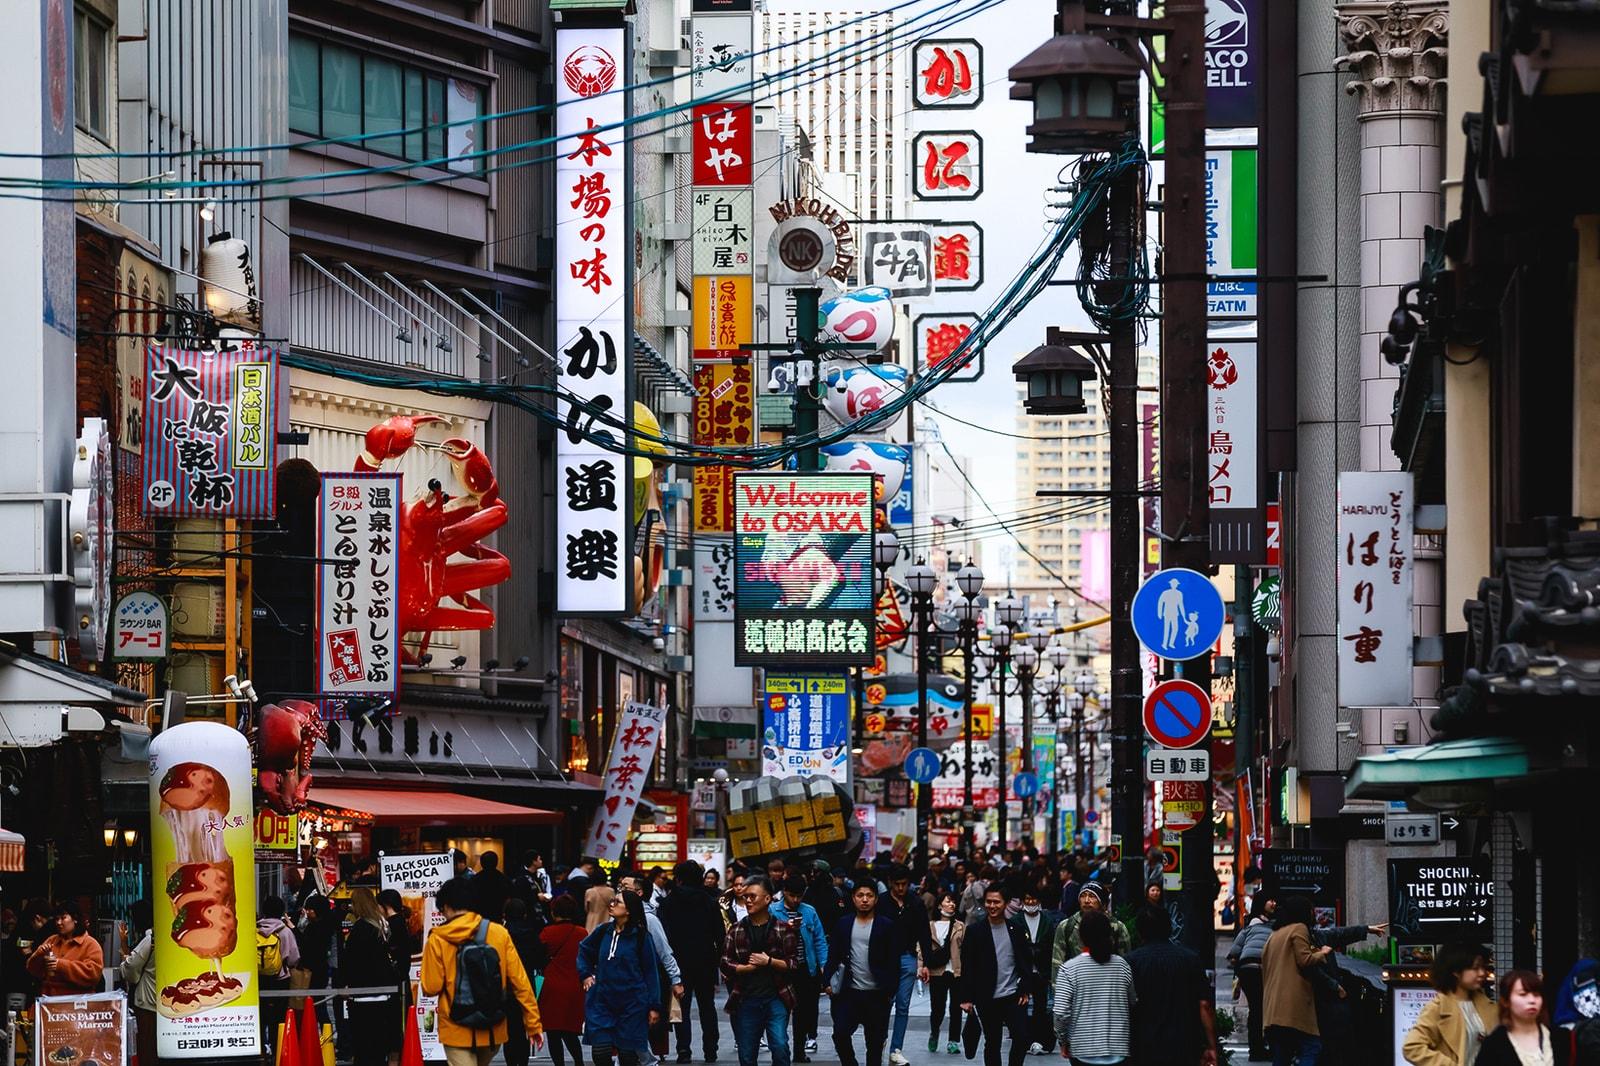 osaka japan city guide travel restaurant dotonbori food market tourist